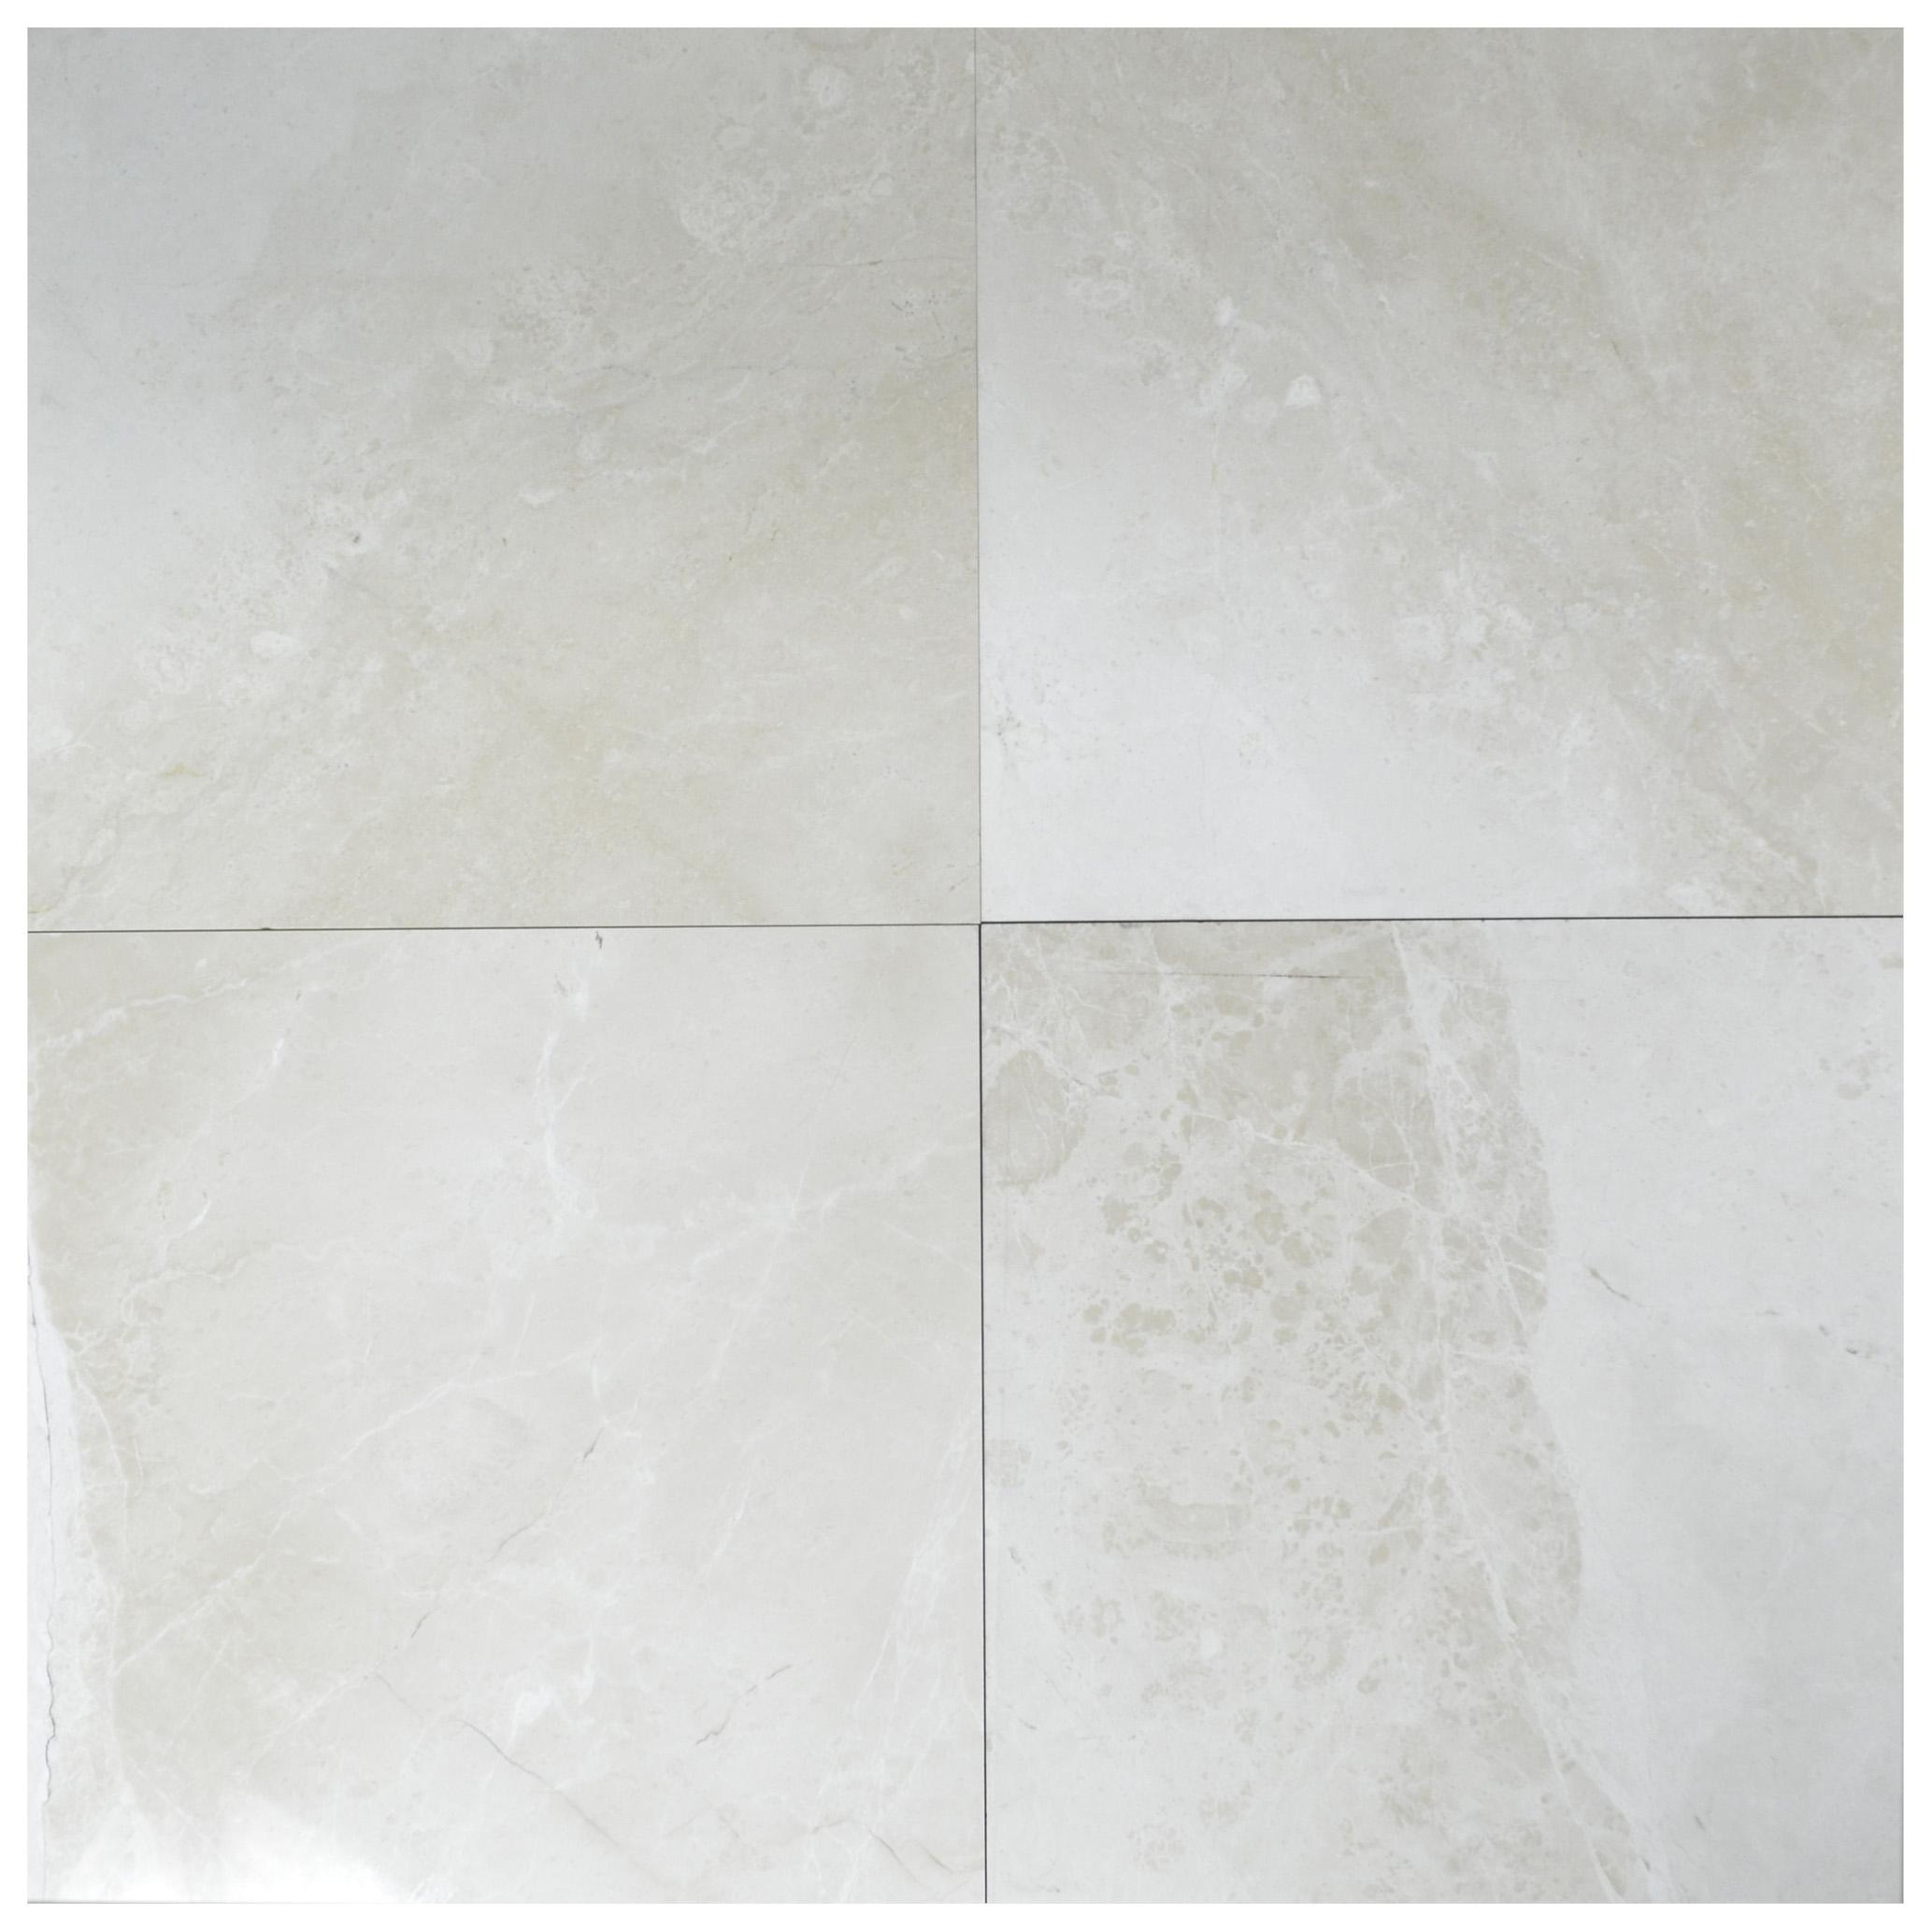 naturella beige classic polished marble tiles 18X18-marble sale-Atlantic Stone Source